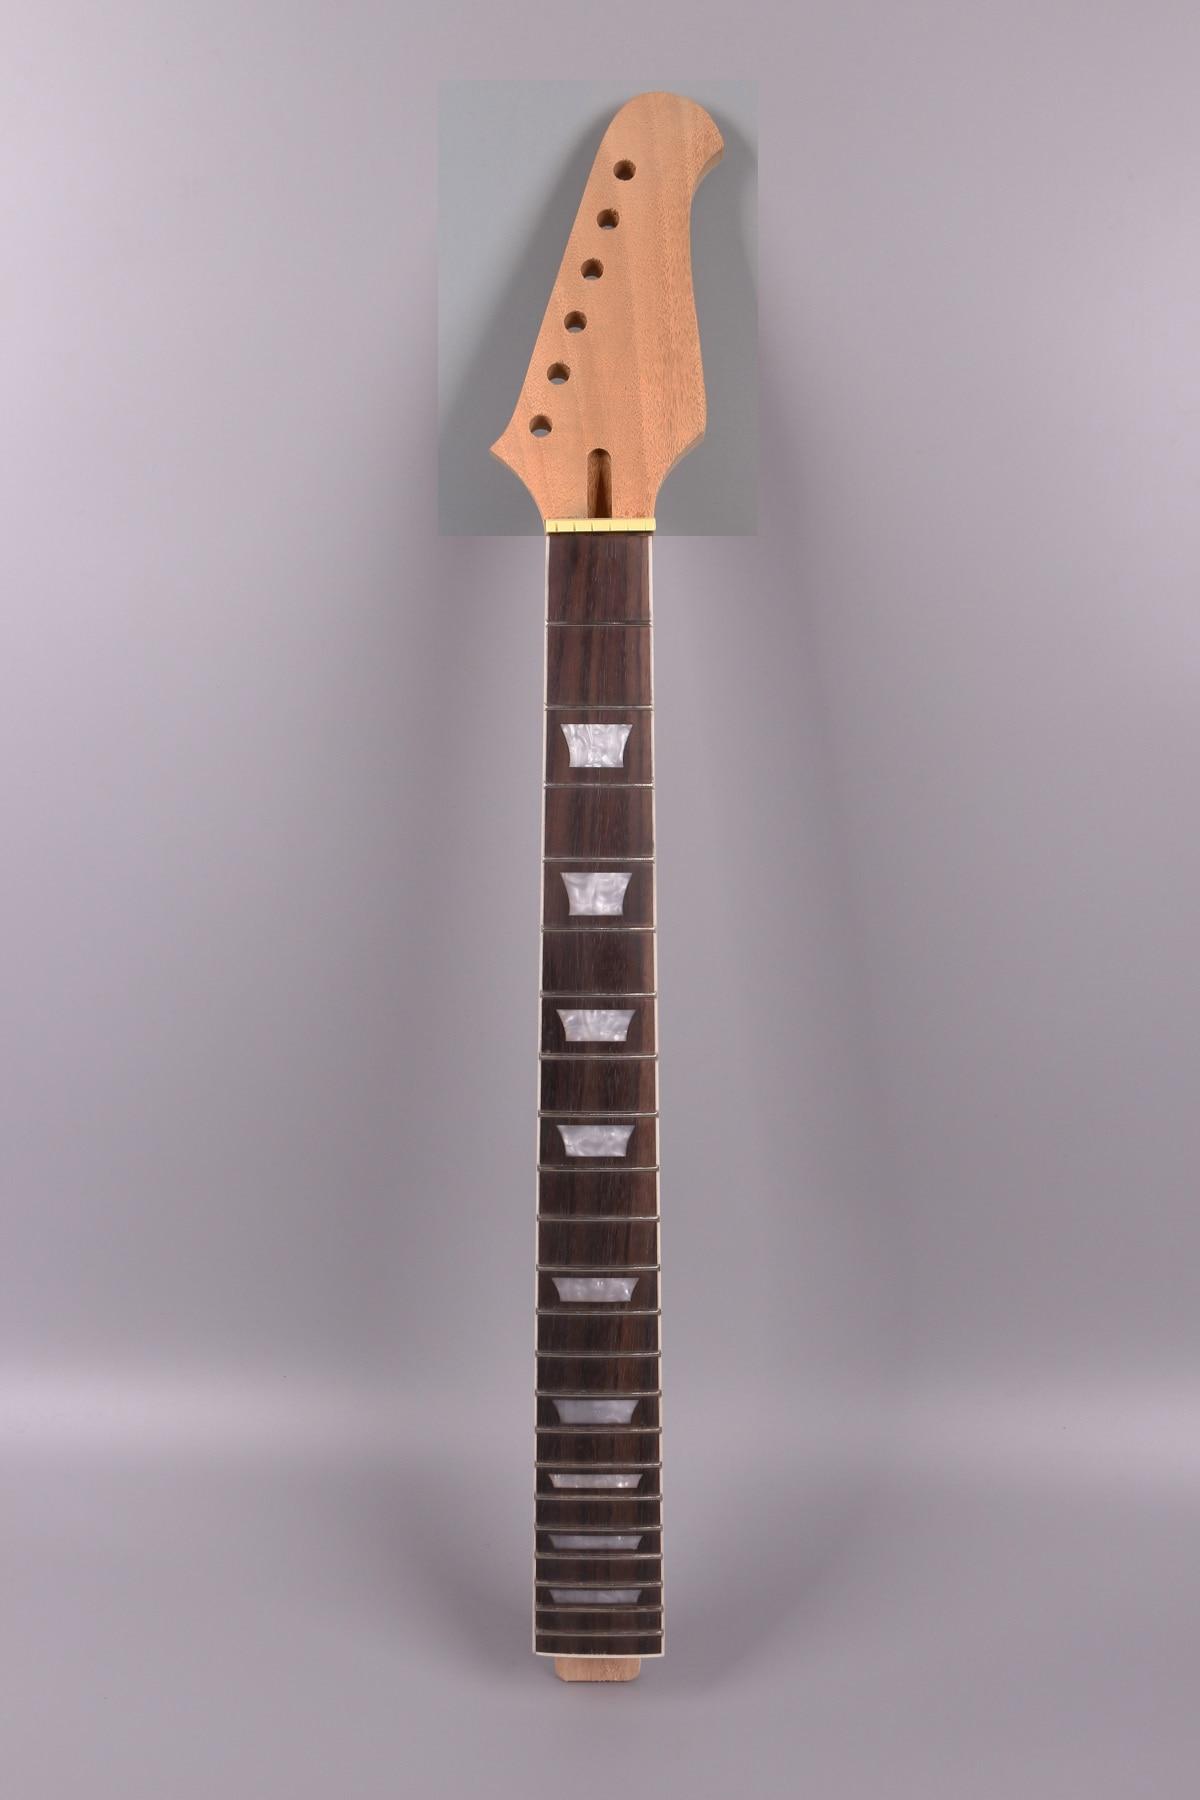 22fret Guitar Neck 24.75 Inch Mahogany Rosewood Fretboard Set In Glue On Style Firebird Headstock